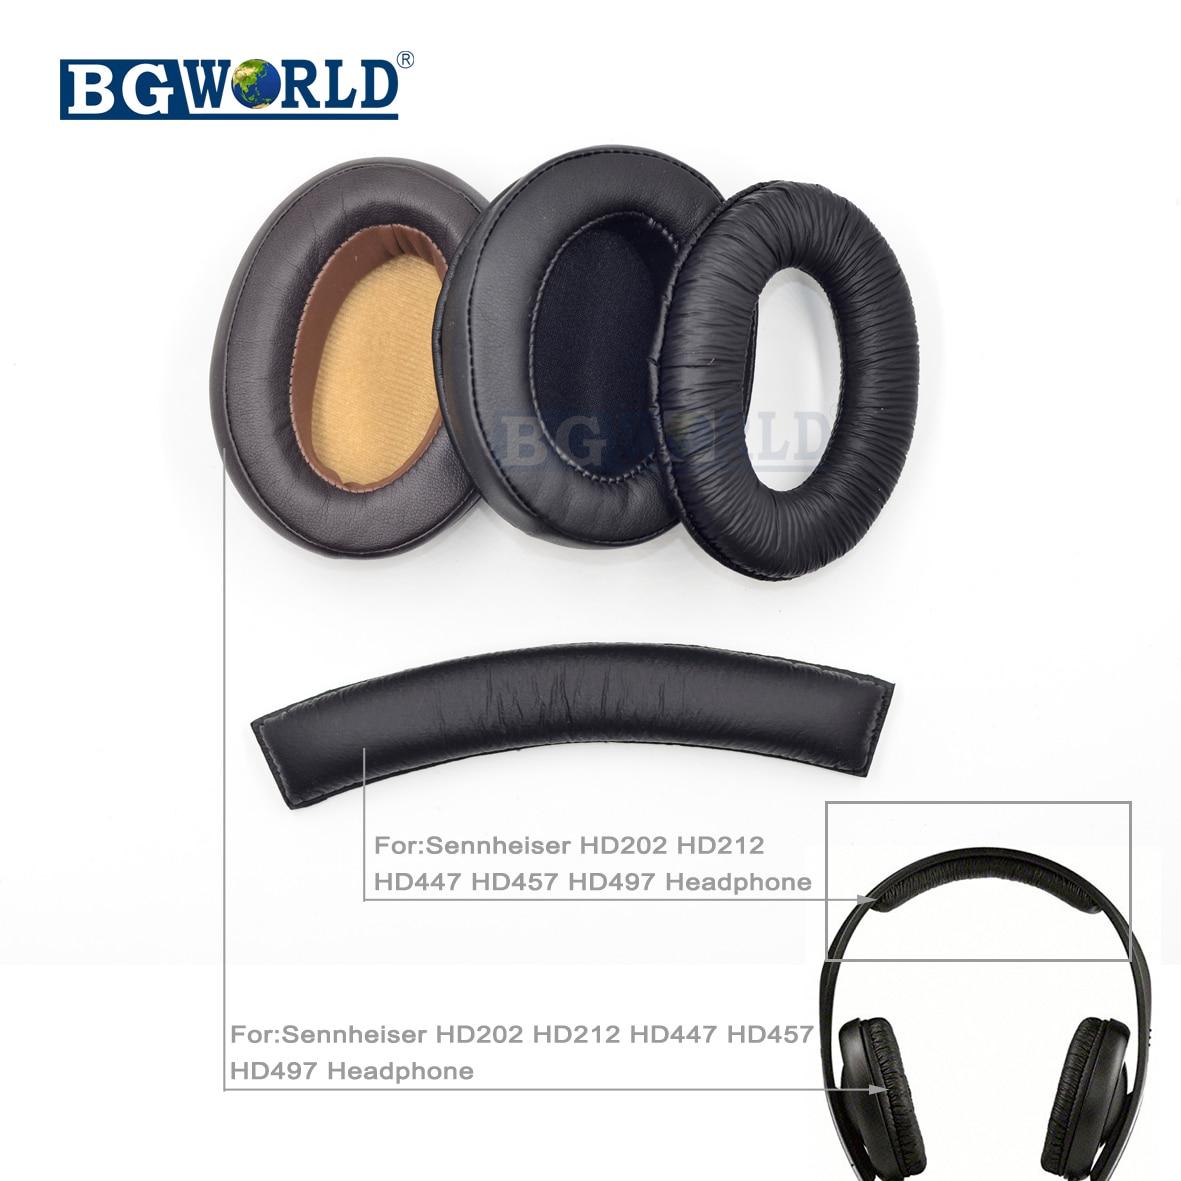 Earphone Accessories Earpad Ear Pad Earphone Soft Foam Cushion Headband Cover Head Band Replacement For Sennheiser Hd202 Hd212 Hd437 Hd447 Hd457 Hd47 Portable Audio & Video